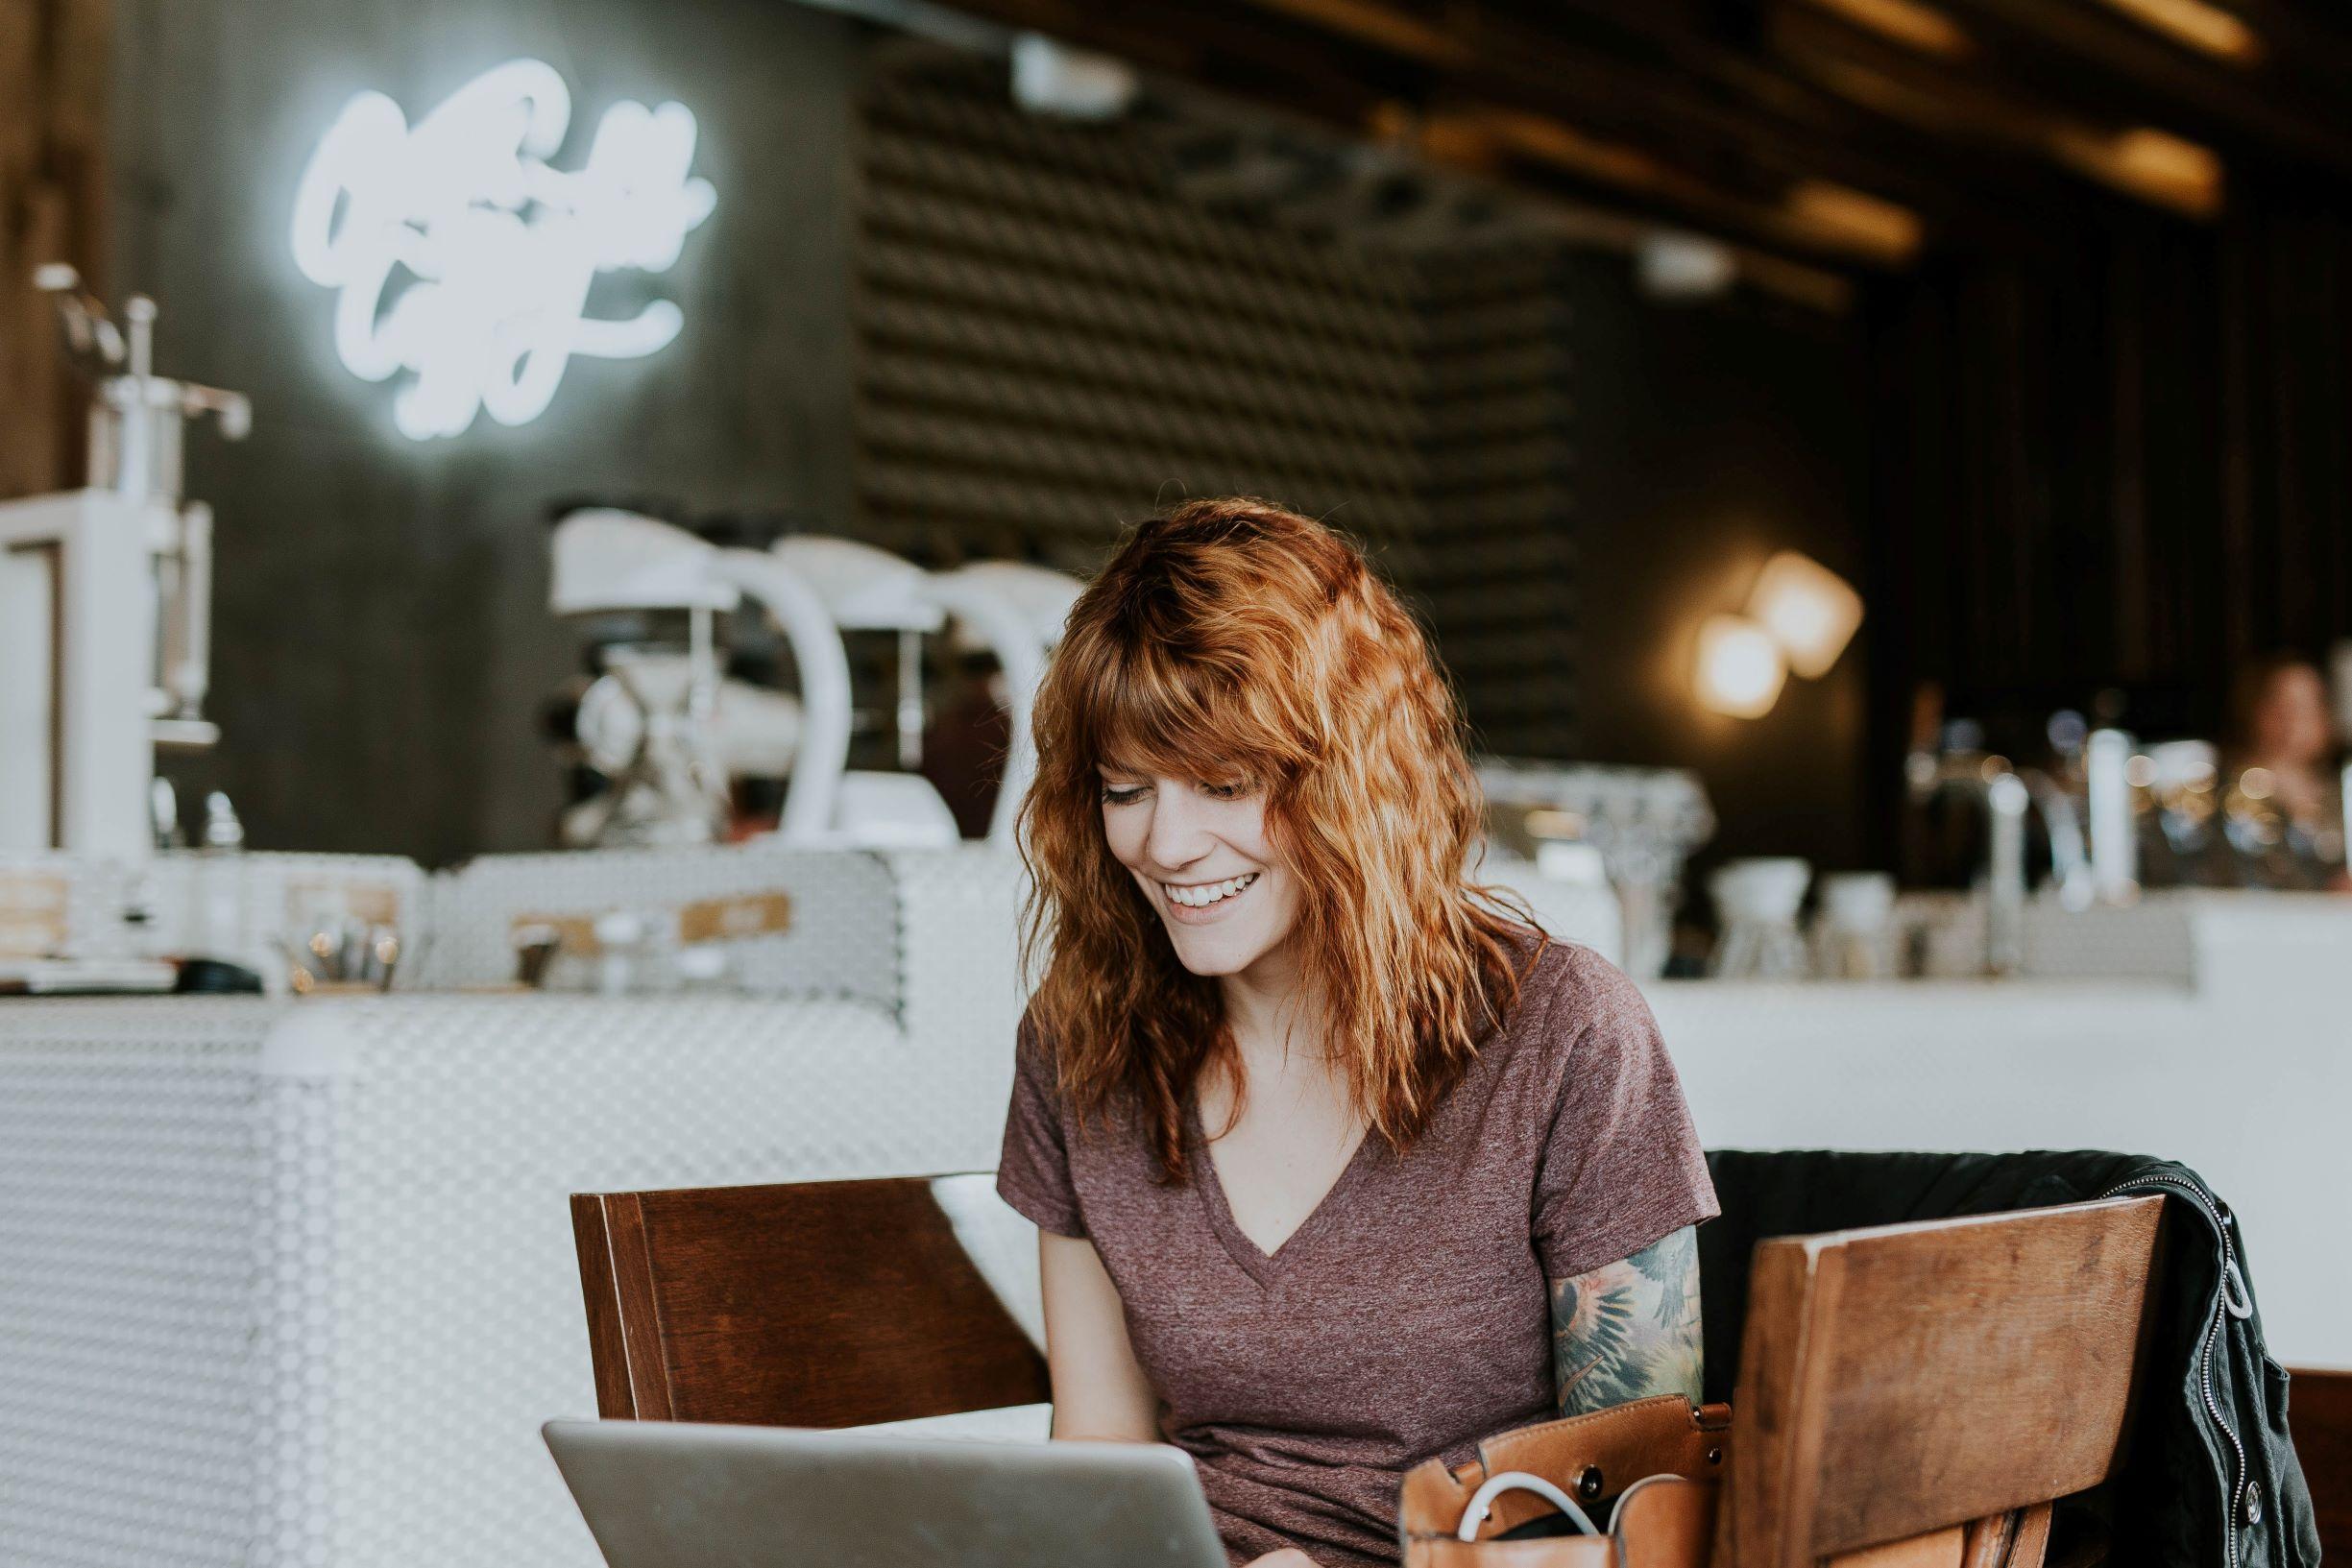 På søndag: Online gudstjeneste for hele familien